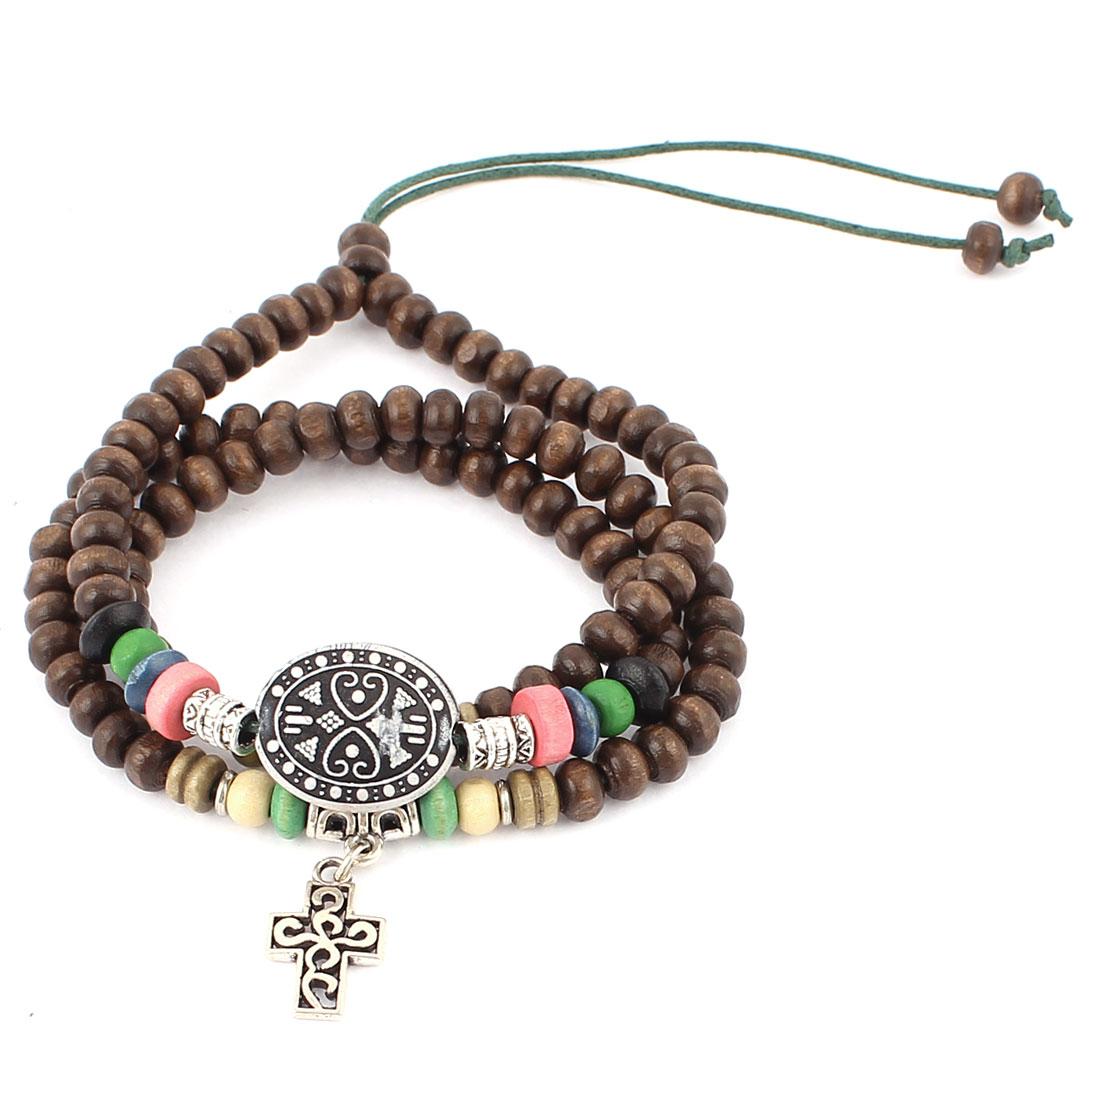 Brown Wood Beaded Nylon String Adjustable Charm Wrap Wrist Strap Bracelet Necklace